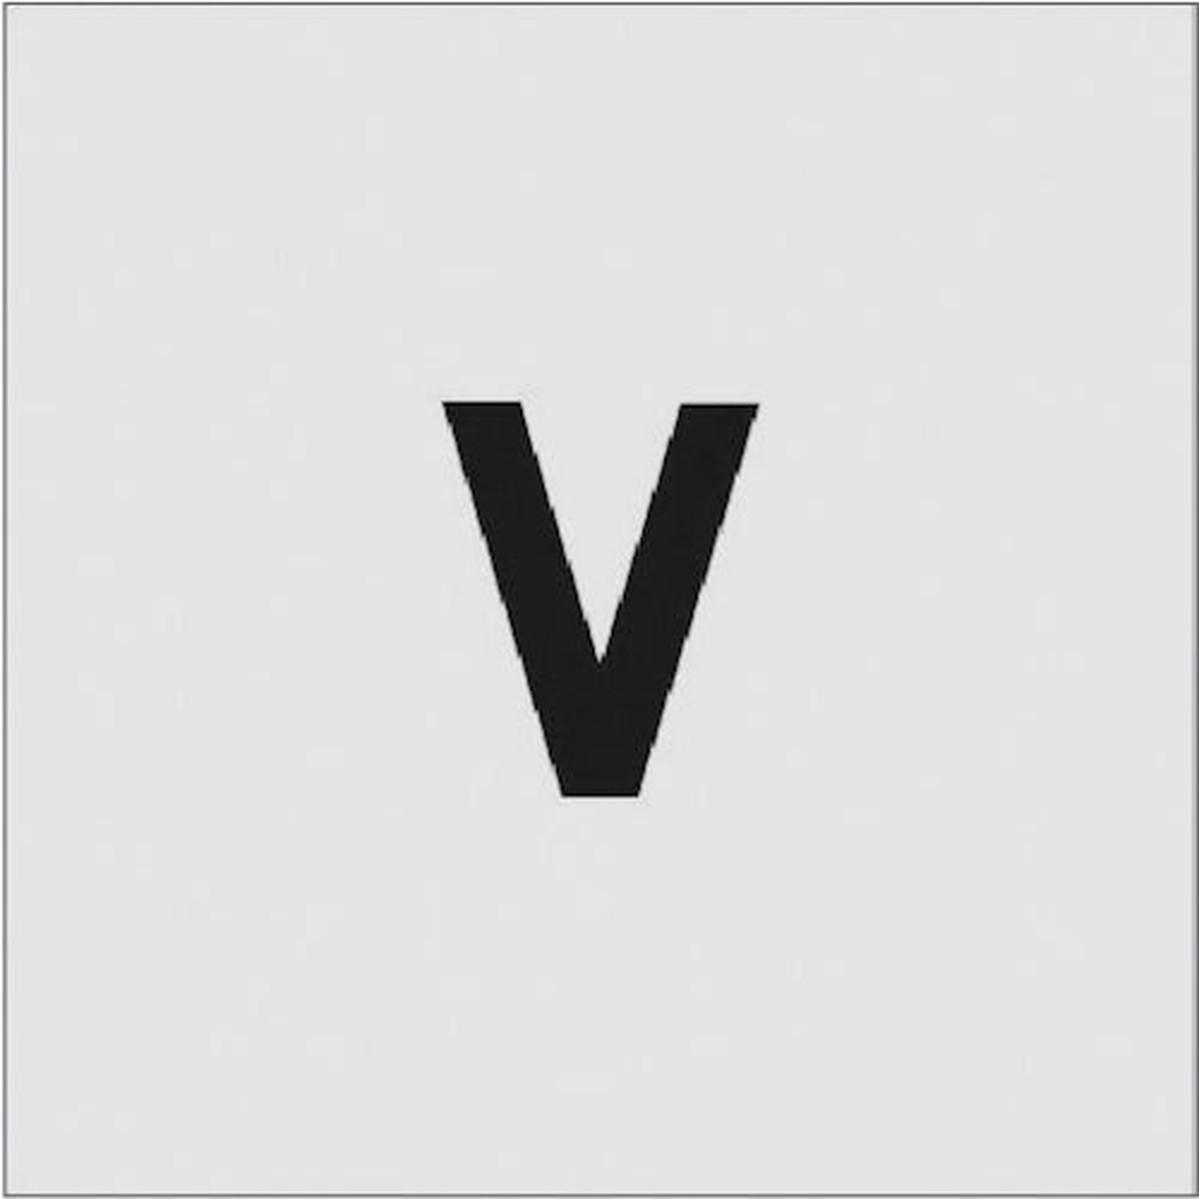 SALE開催中 あす楽対応 DIY用品 IM ステンシル 国内即発送 1枚 文字サイズ50×40mm V